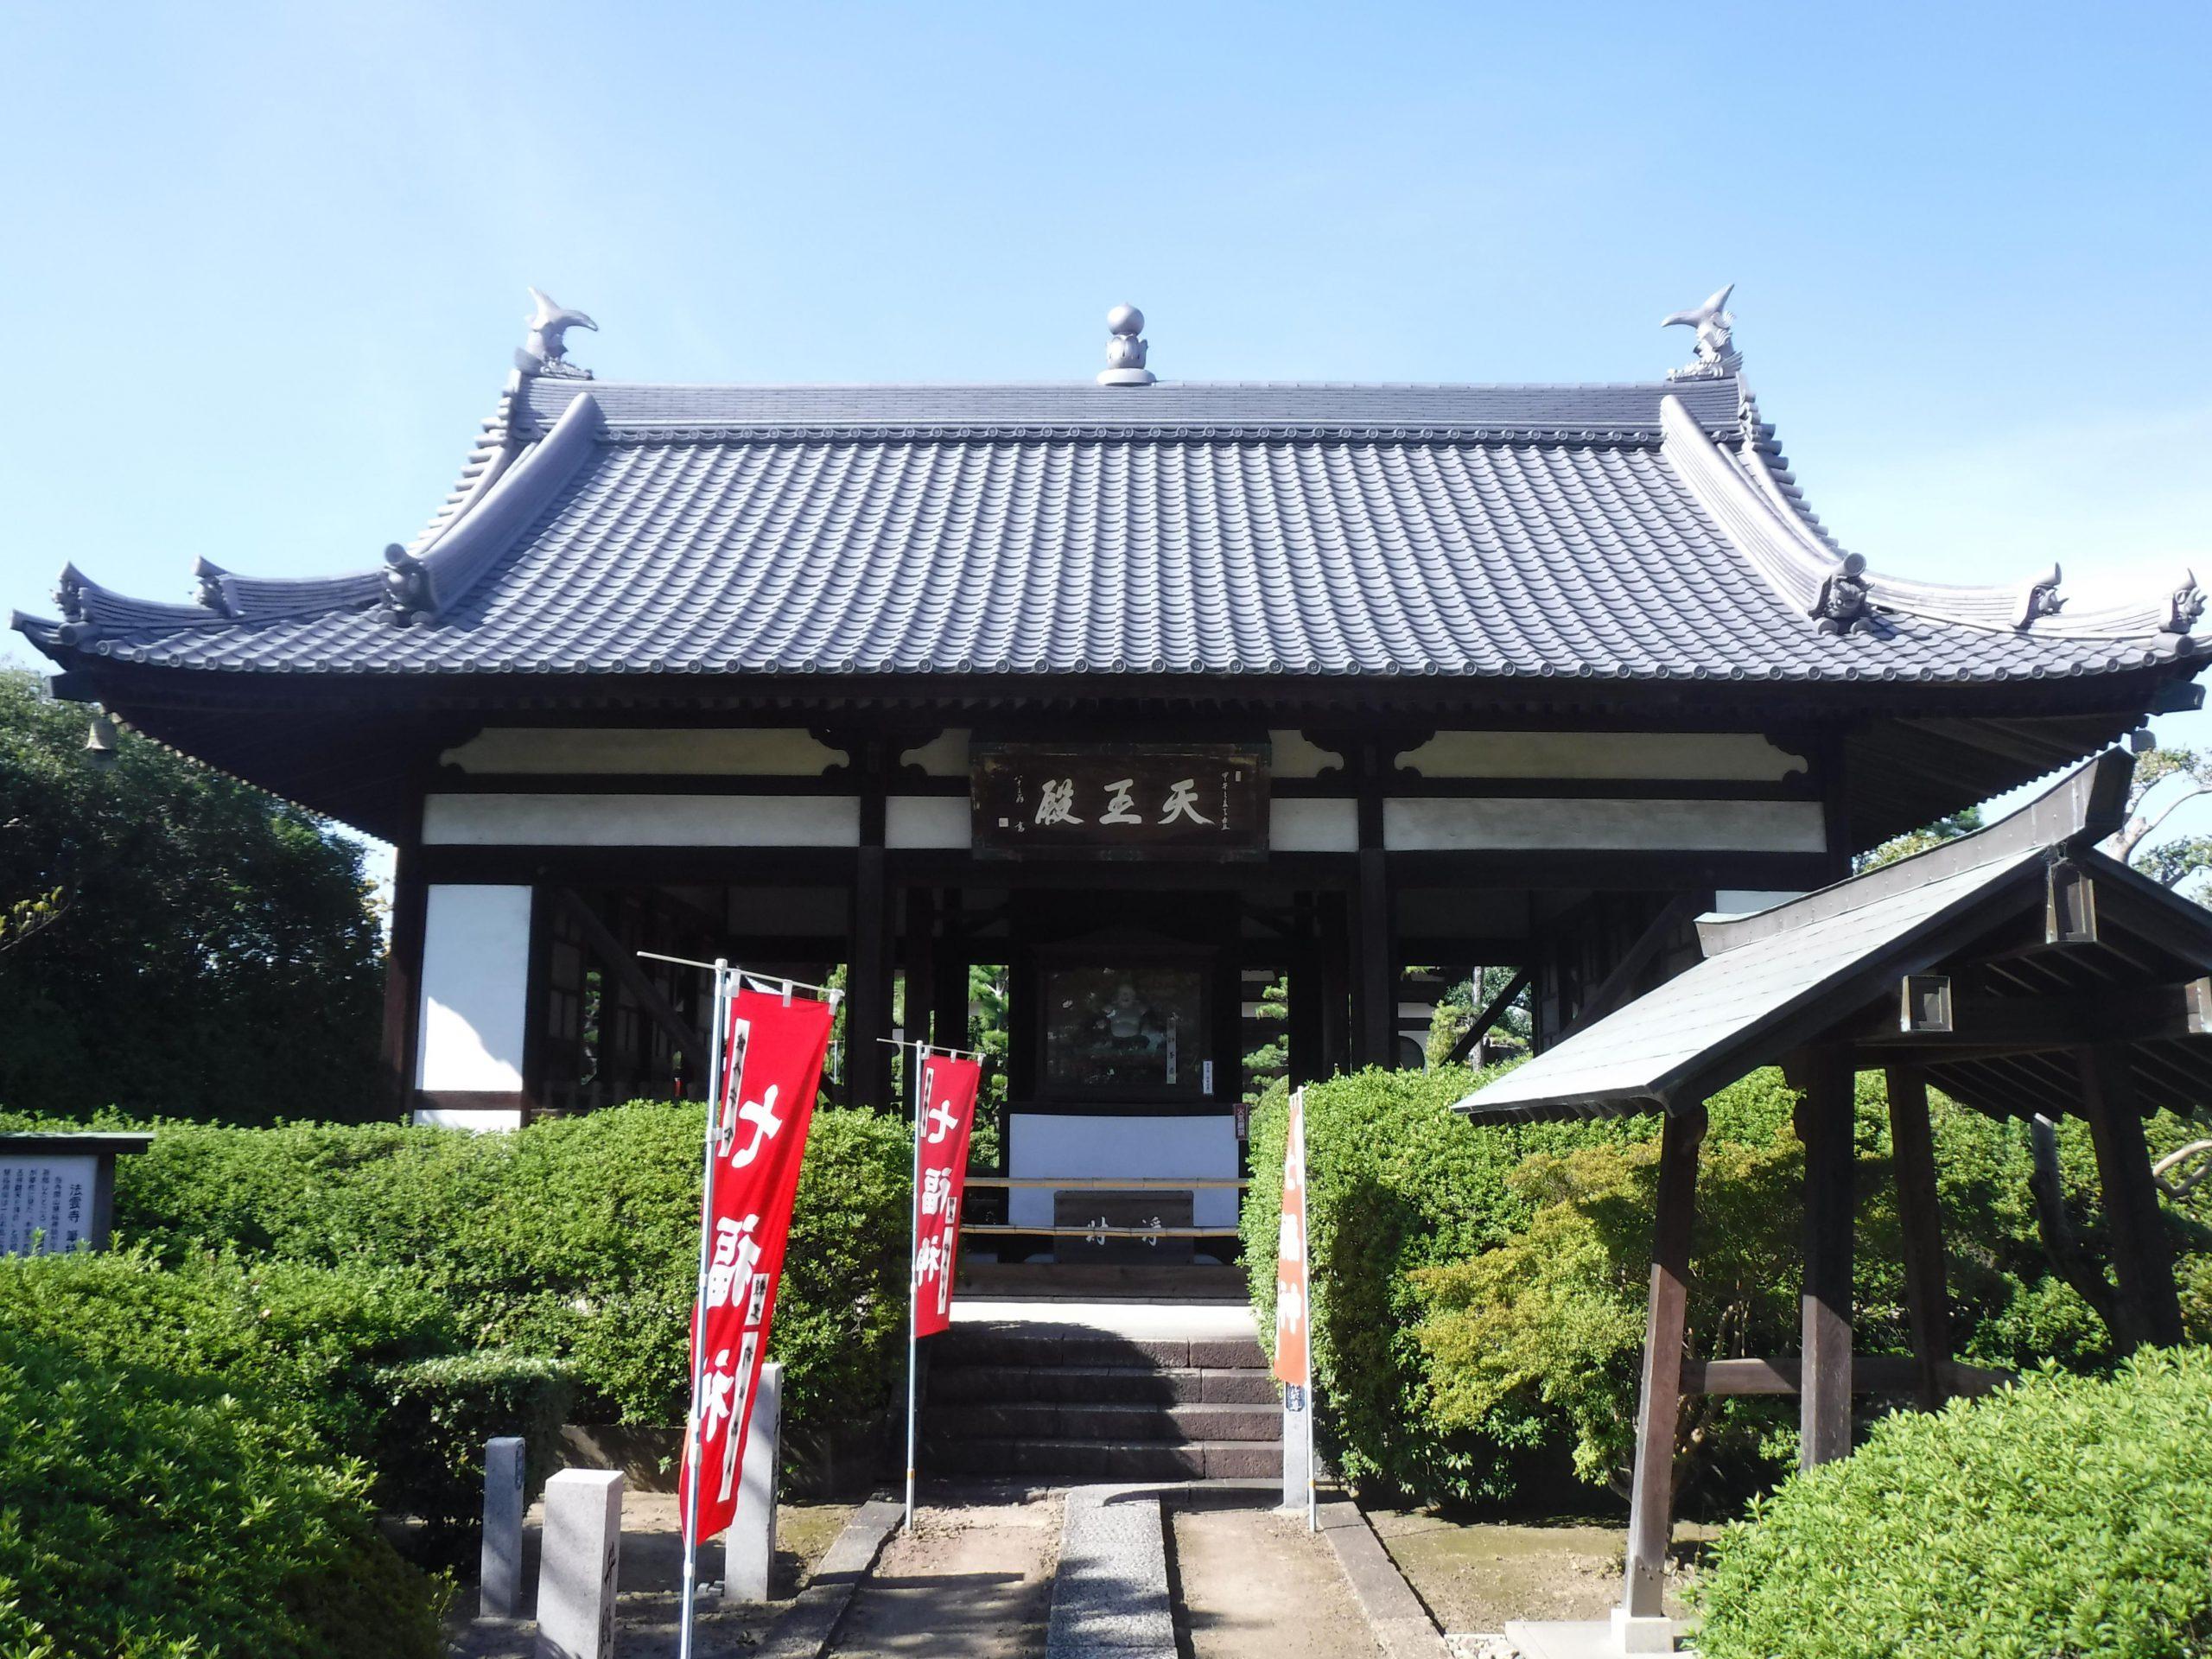 <p>天王殿(市指定)</p>四方に四天王を安置し、中央に布袋尊を祀る。黄檗宗では布袋尊を弥勒菩薩と呼ぶ。